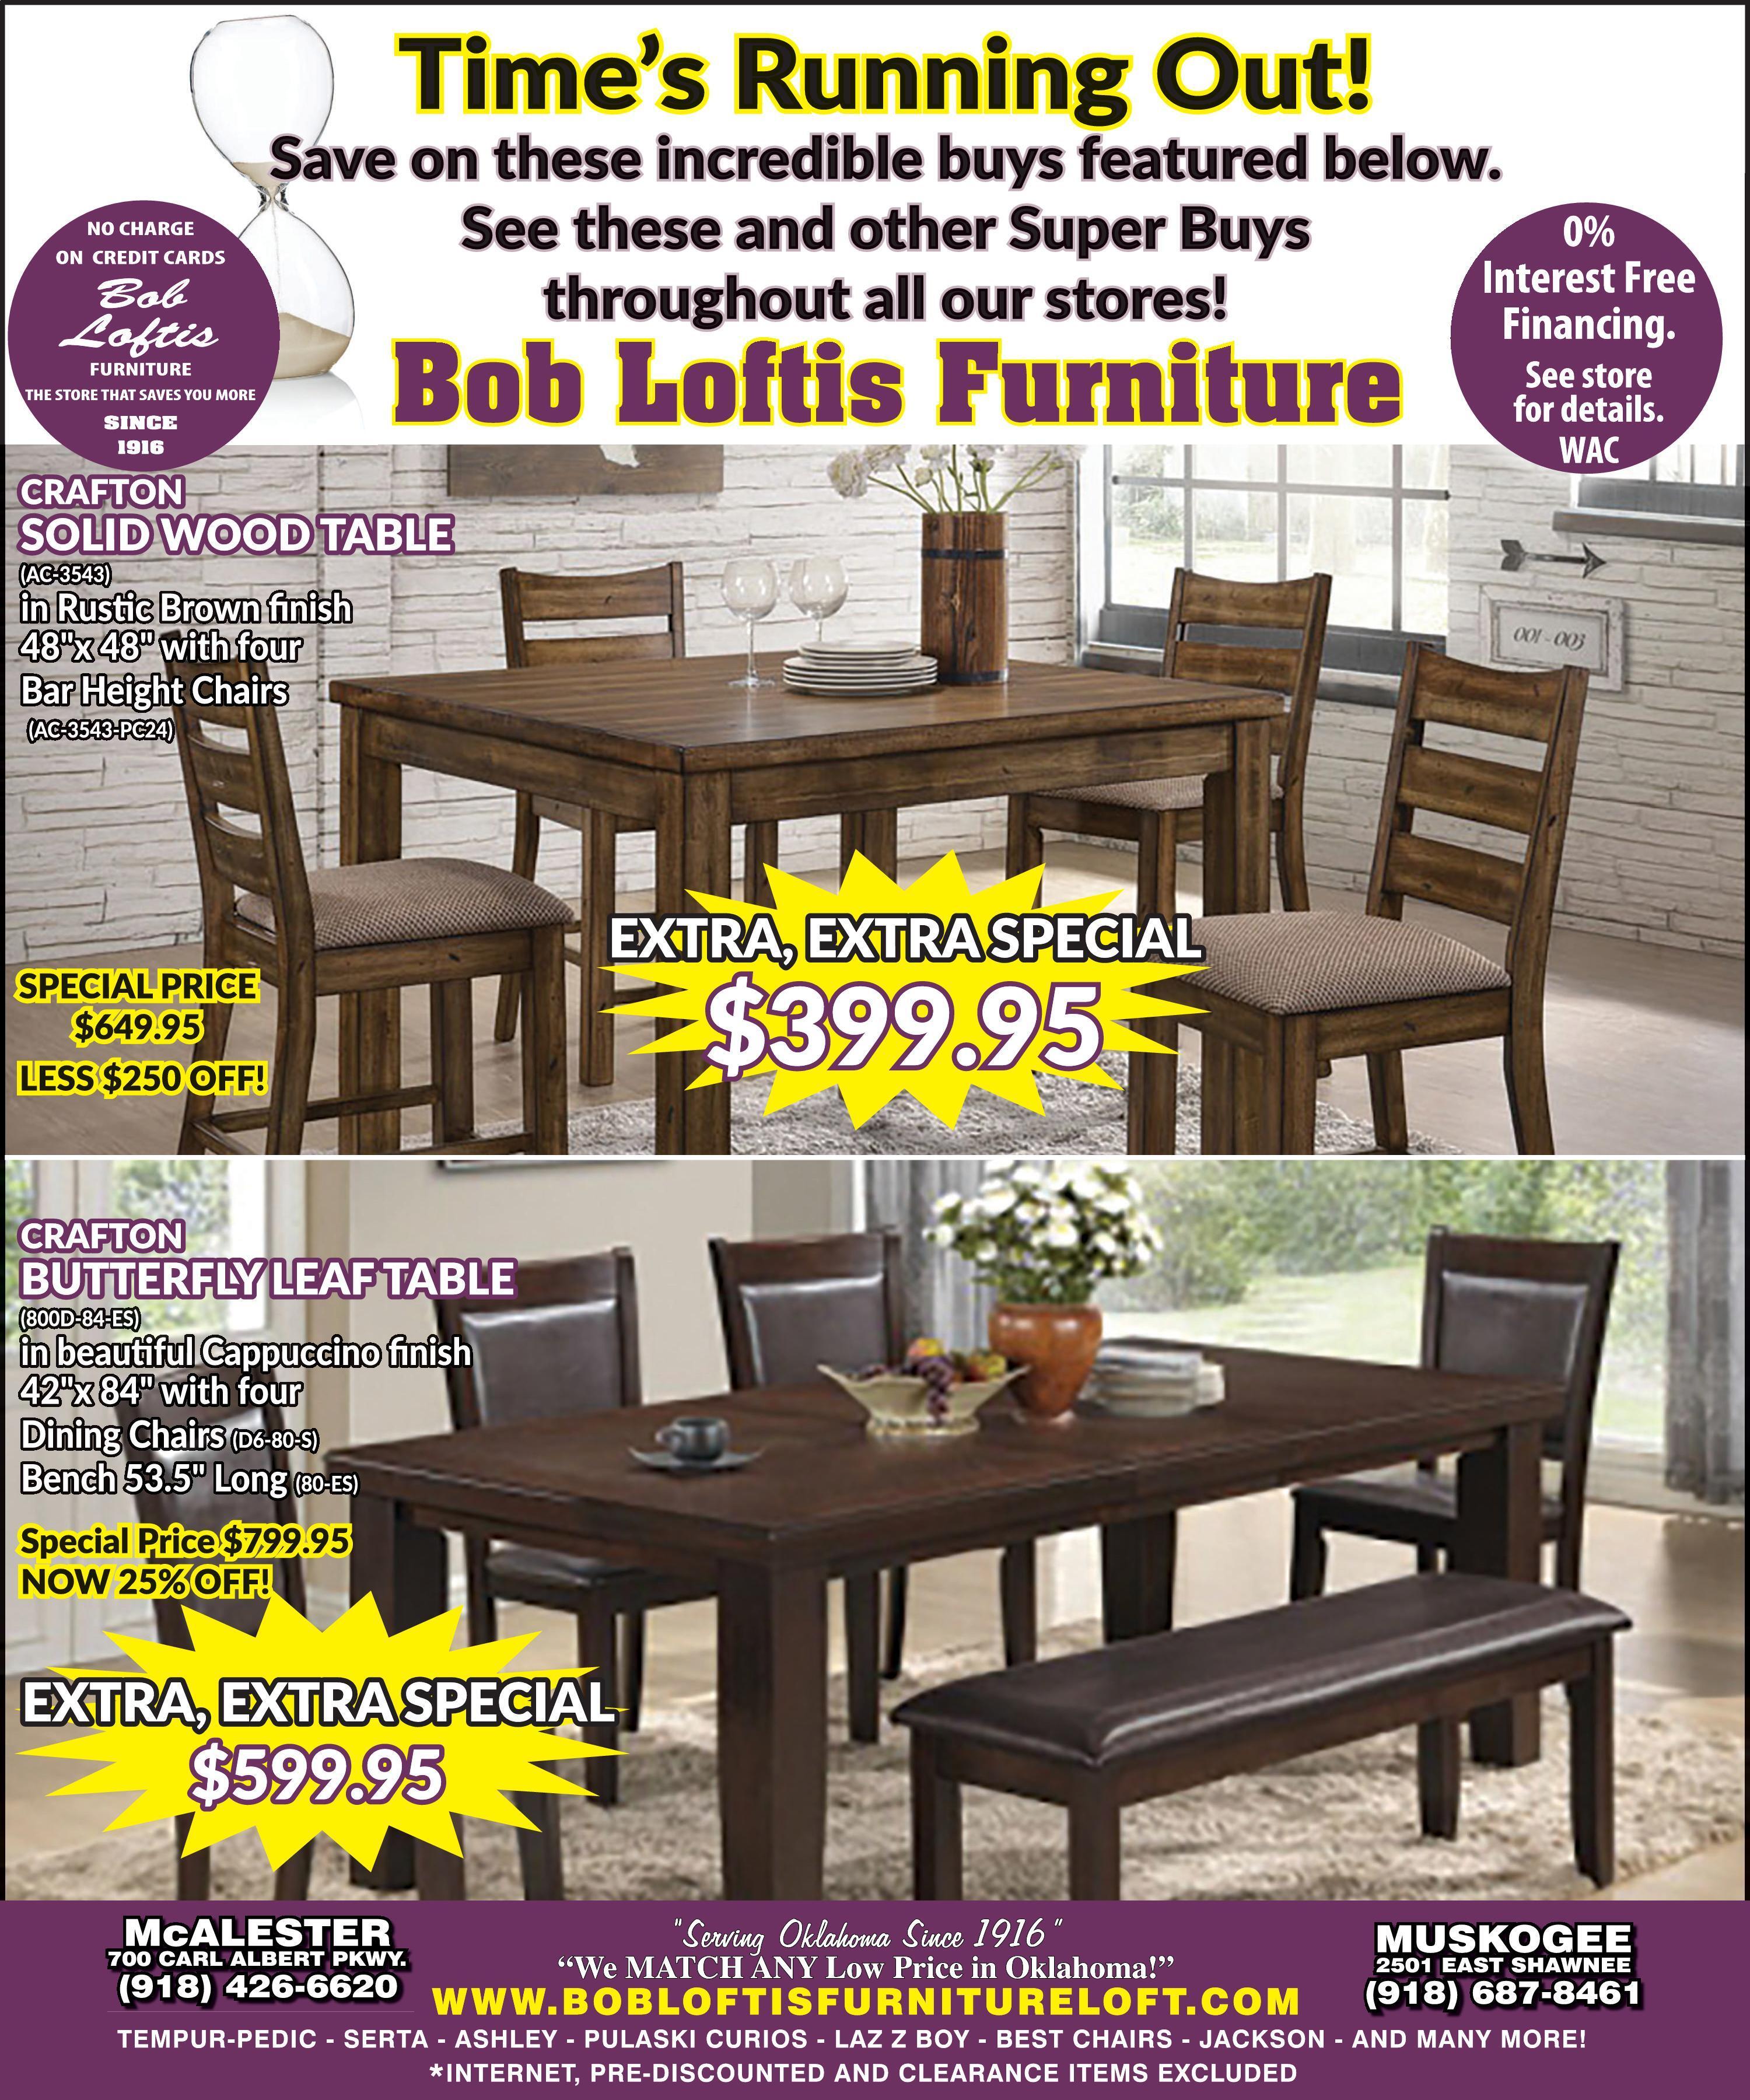 Merveilleux Bob Loftis Furniture. View Ad Details »